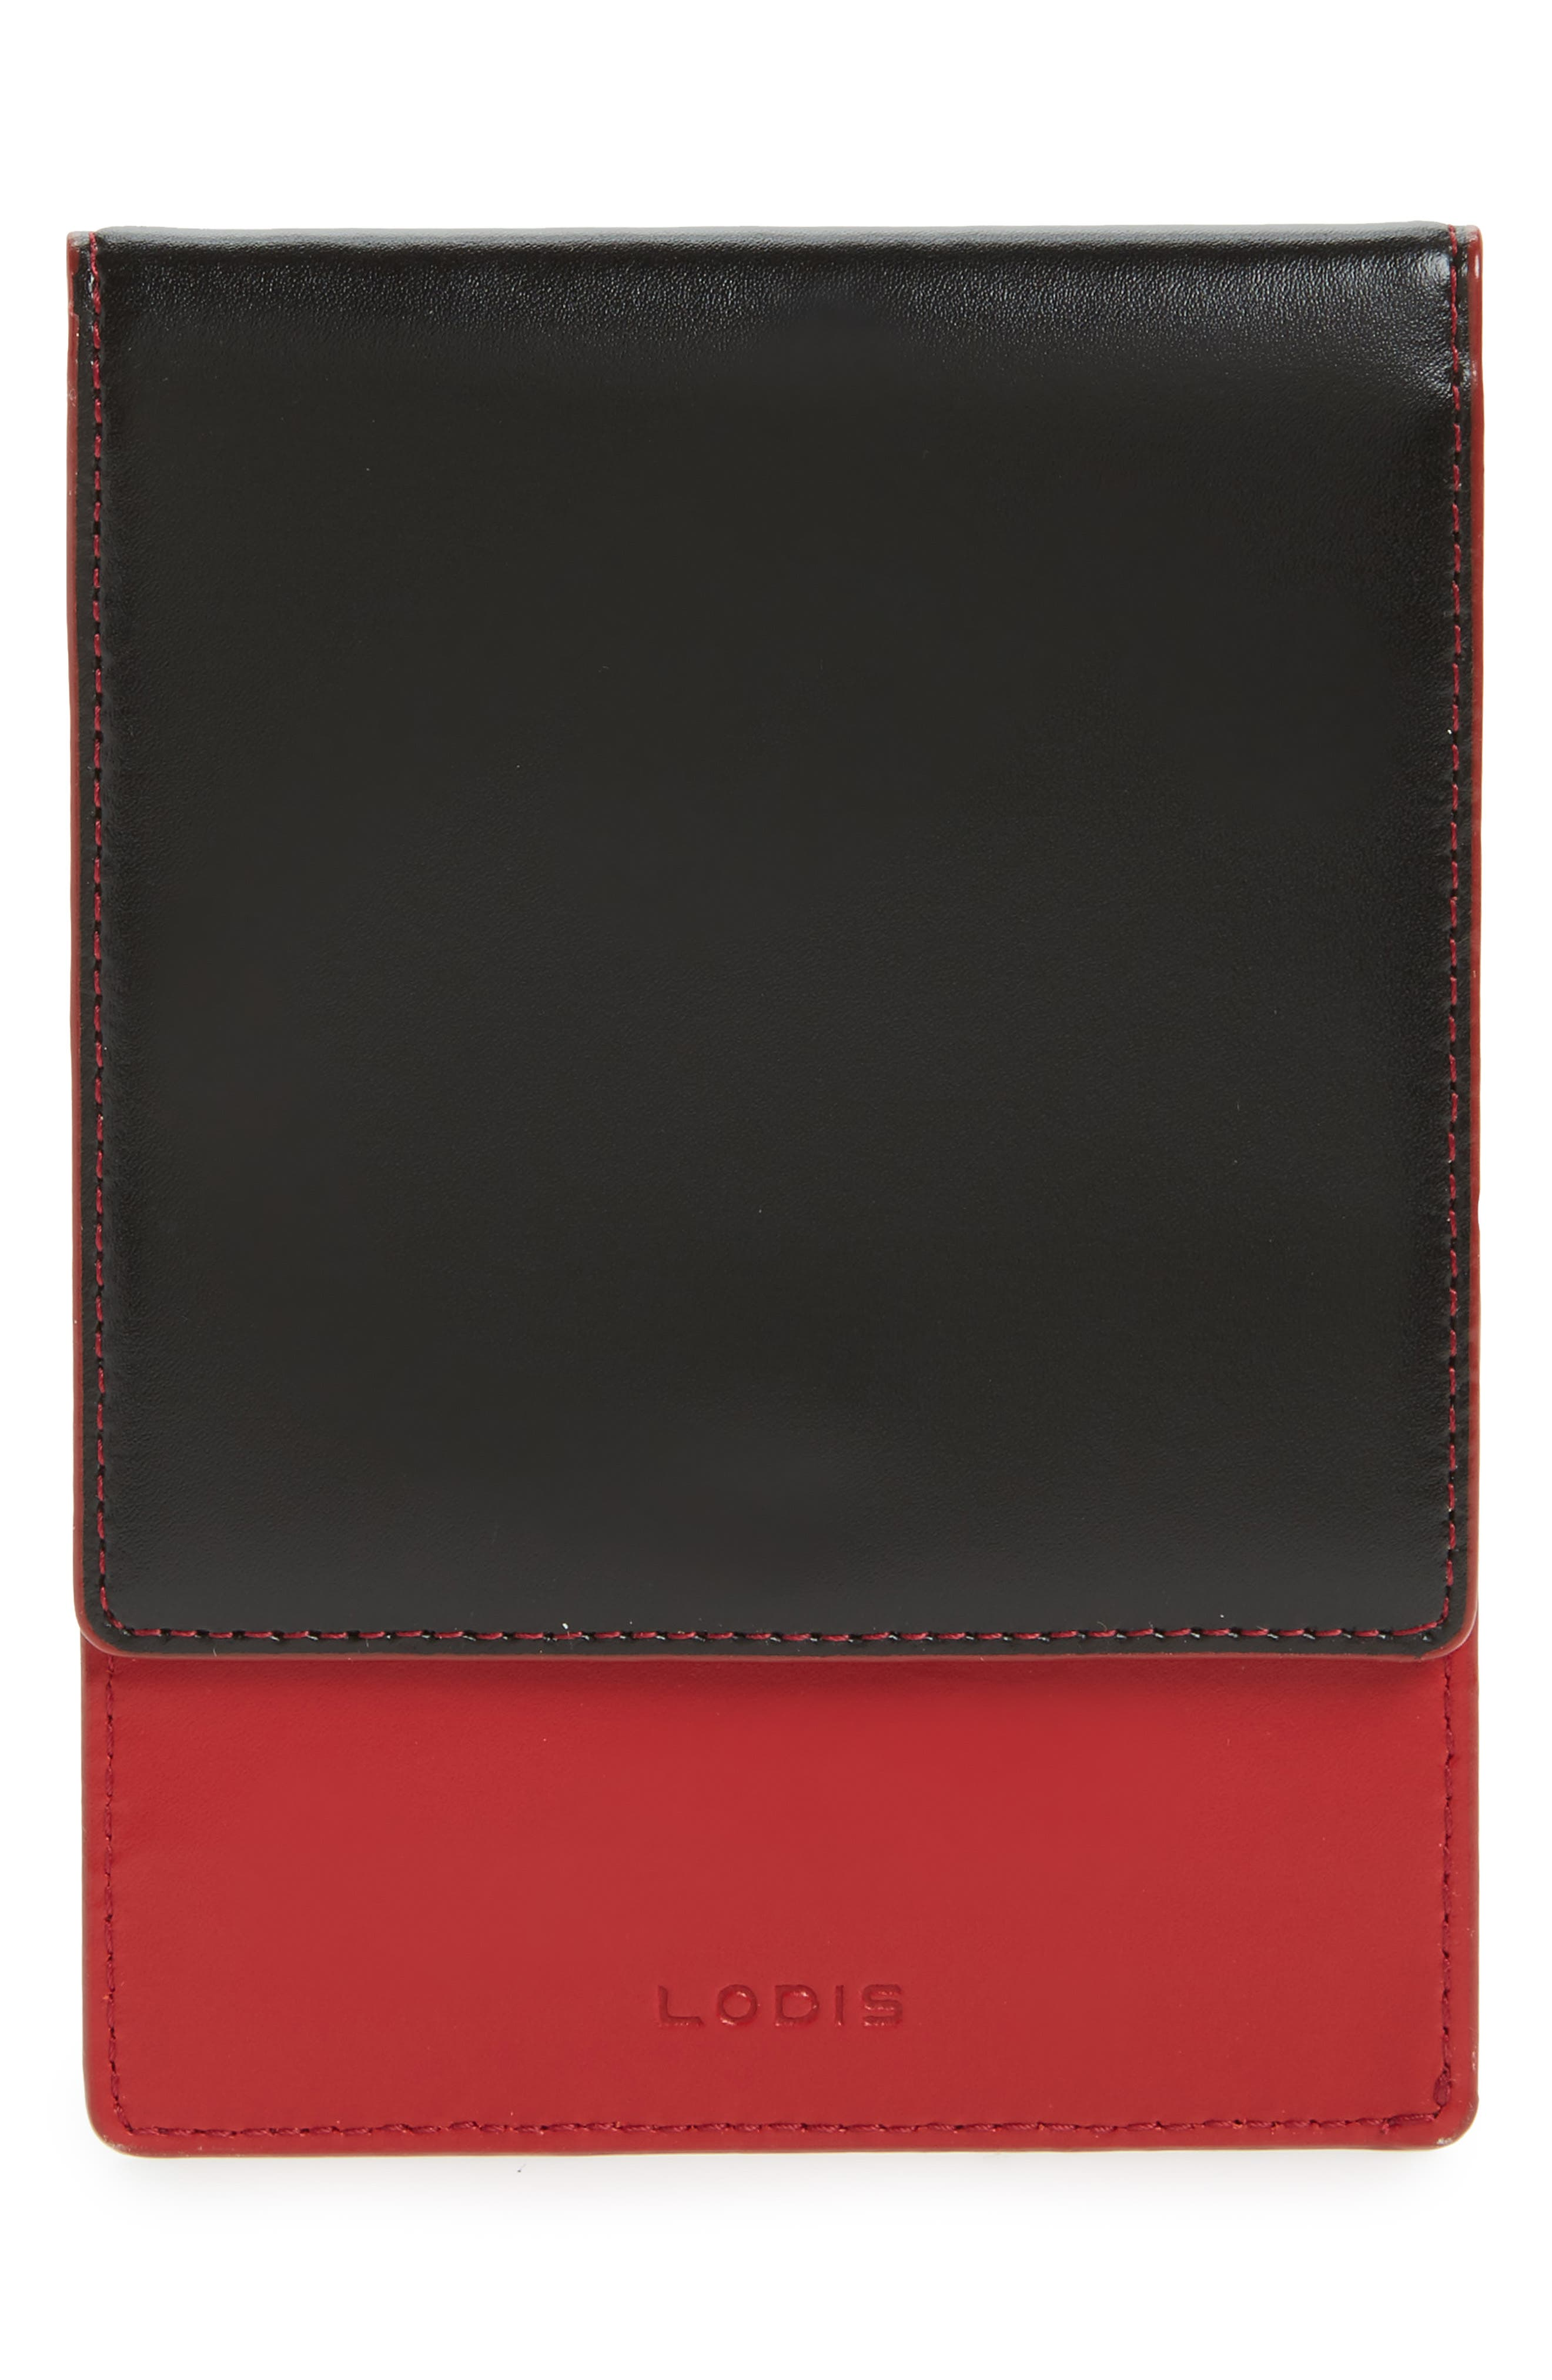 Main Image - LODIS Audrey Under Lock & Key Skyler Leather Passport Wallet